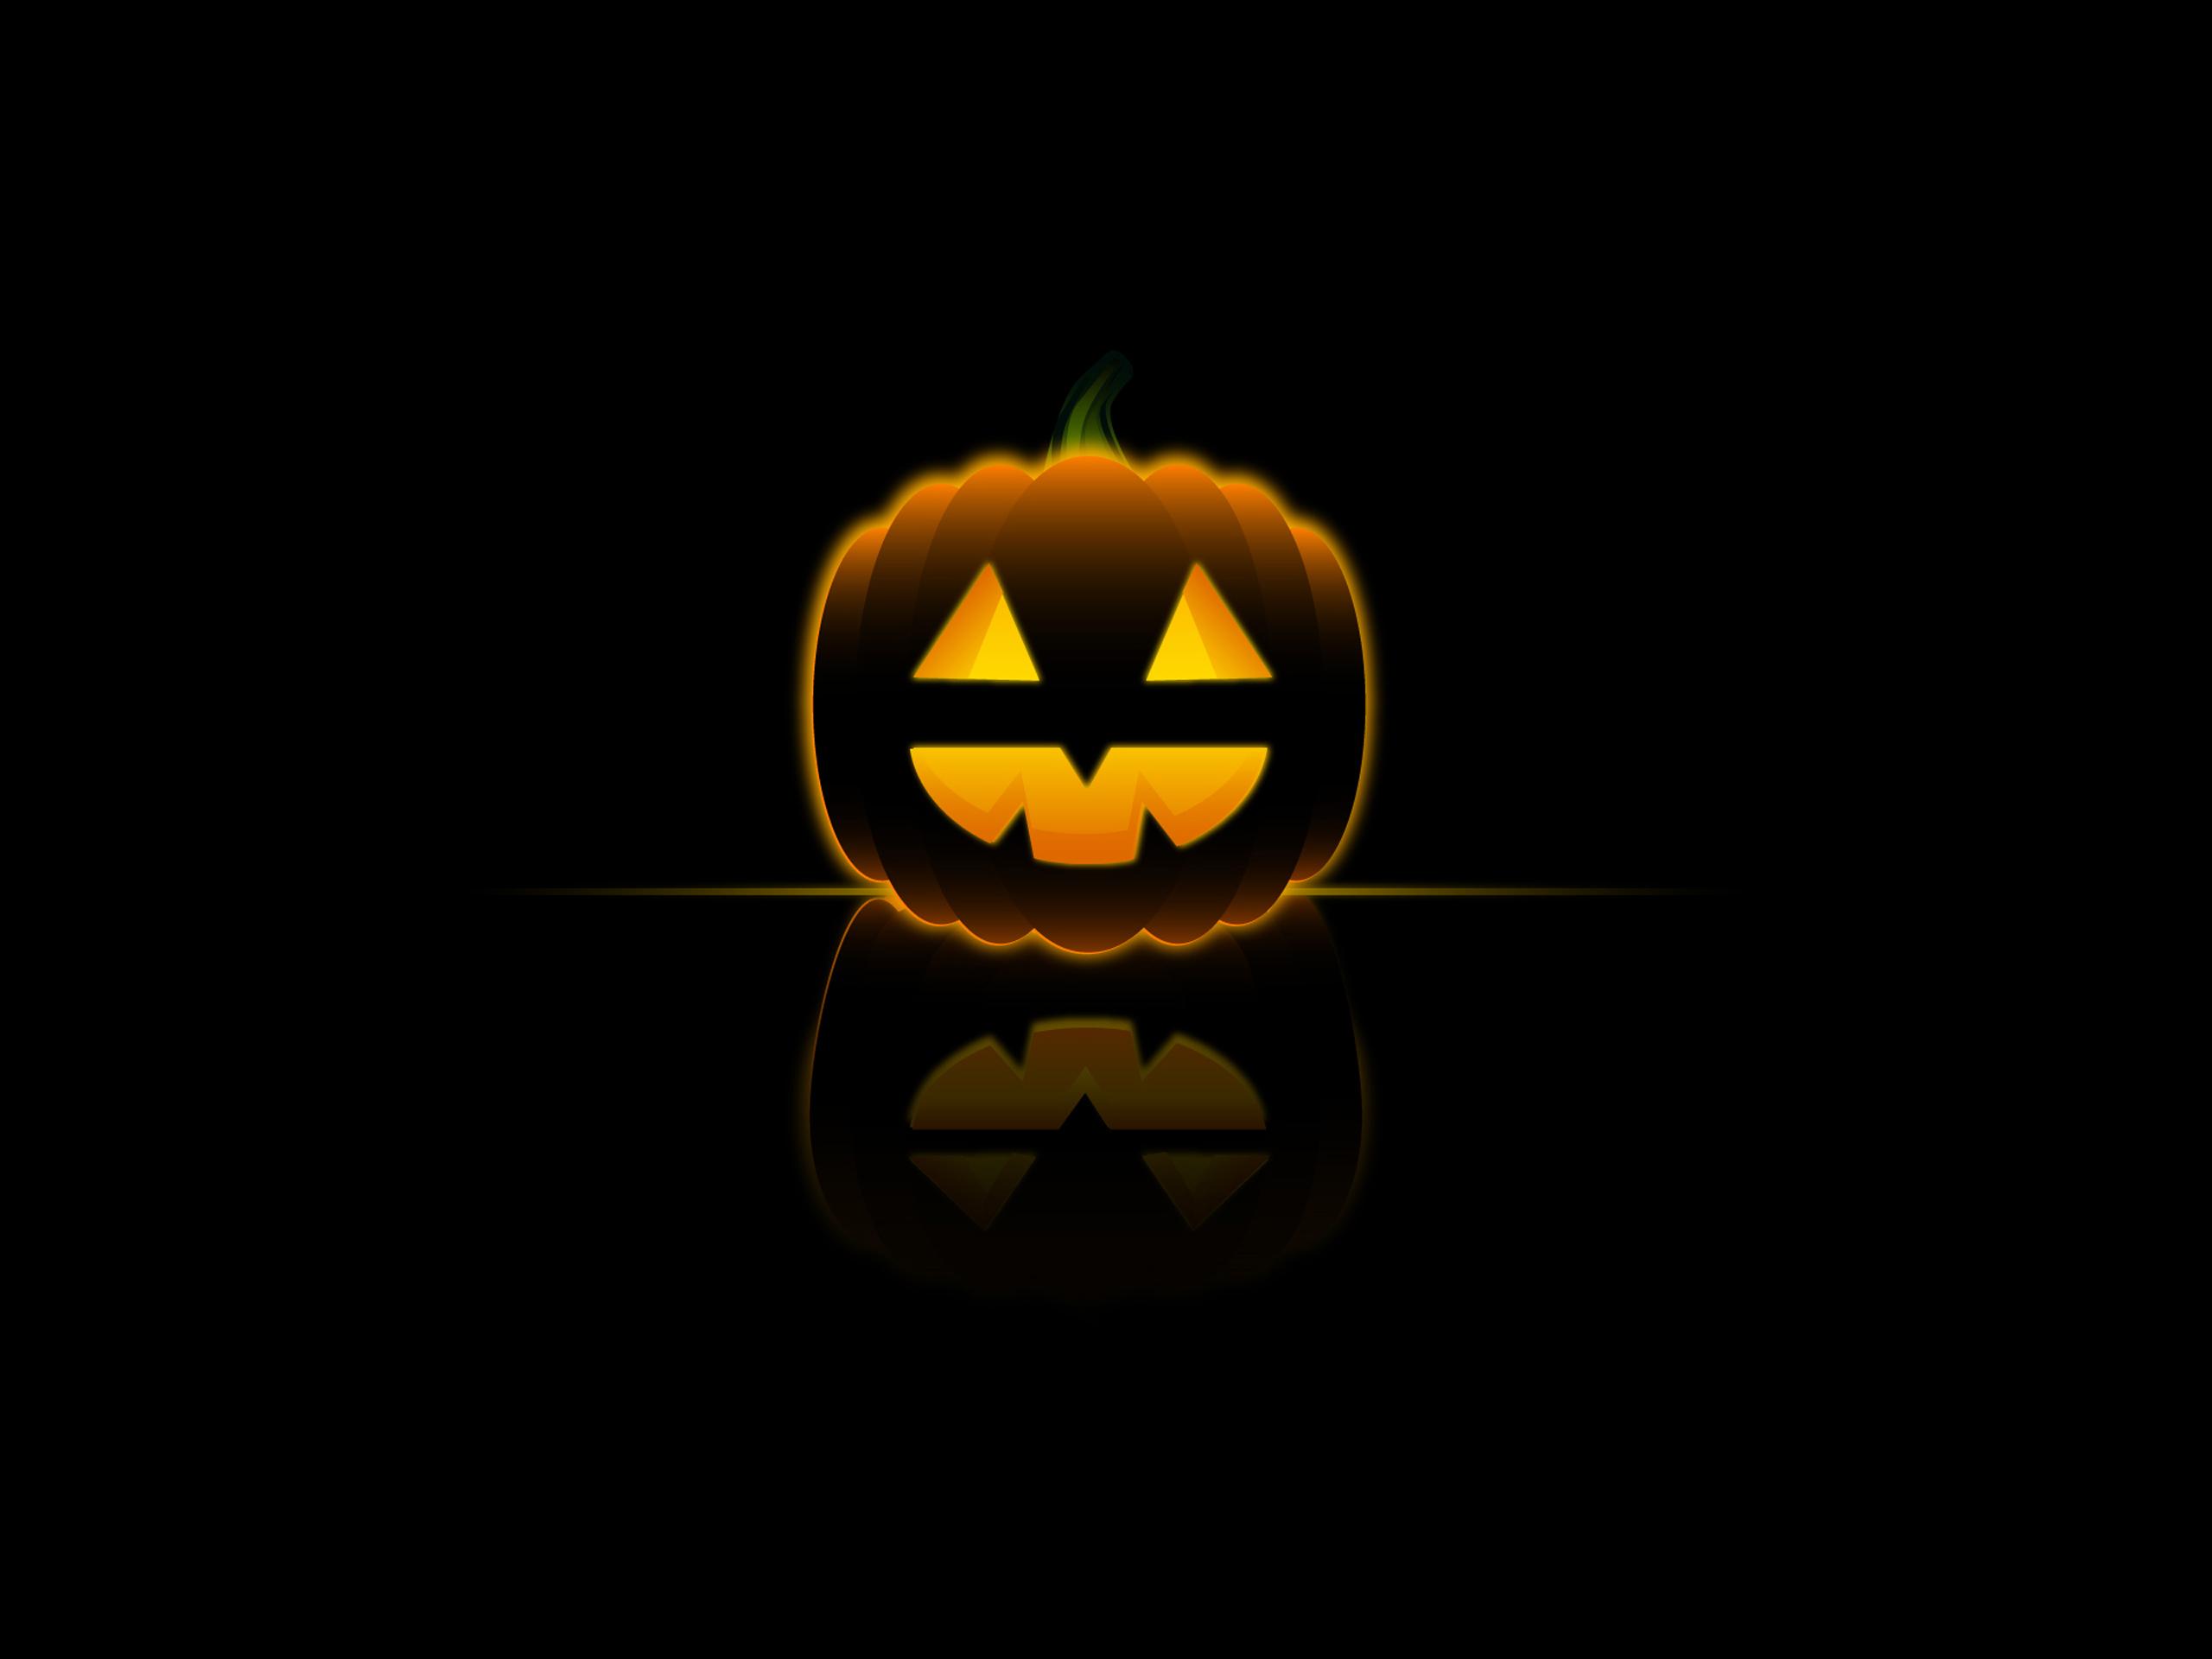 Wonderful Wallpaper Halloween Facebook - halloween-pumpkin-004  Picture_47694.jpg